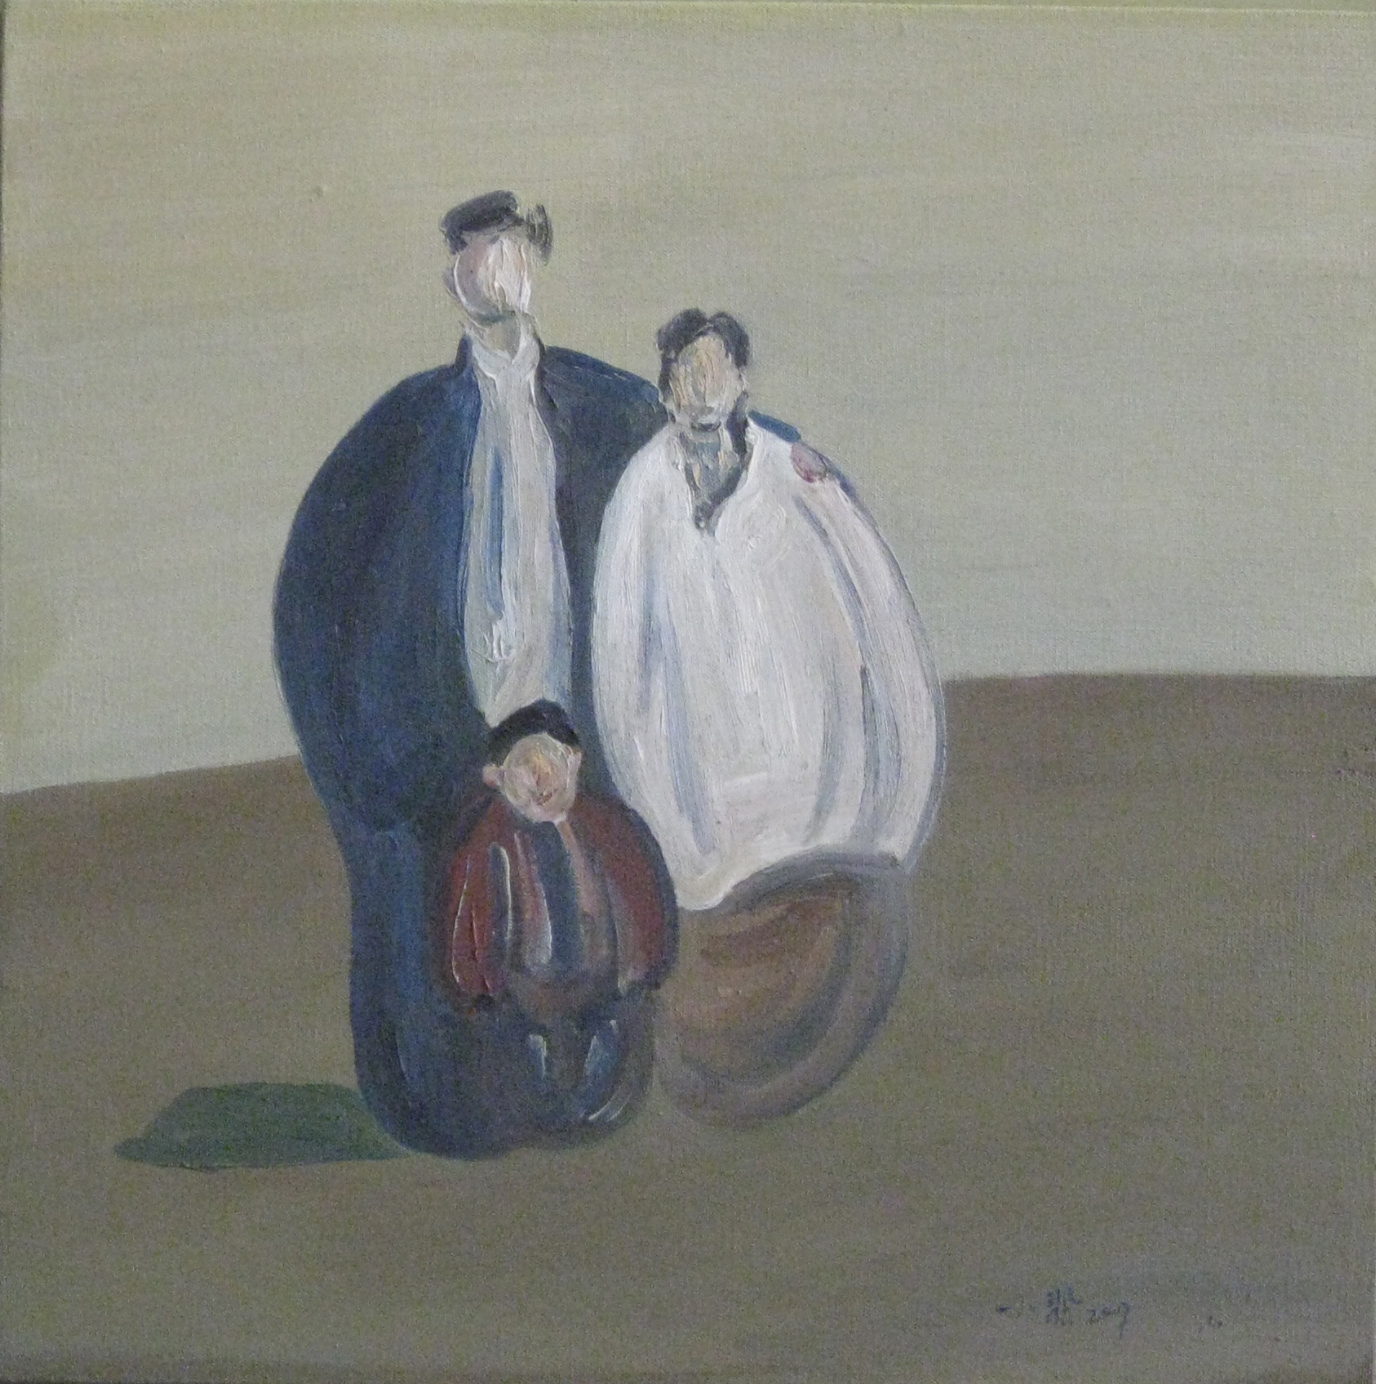 Gao, Xiaofei 我们仨 60x60 布面油画 $4,000.jpg